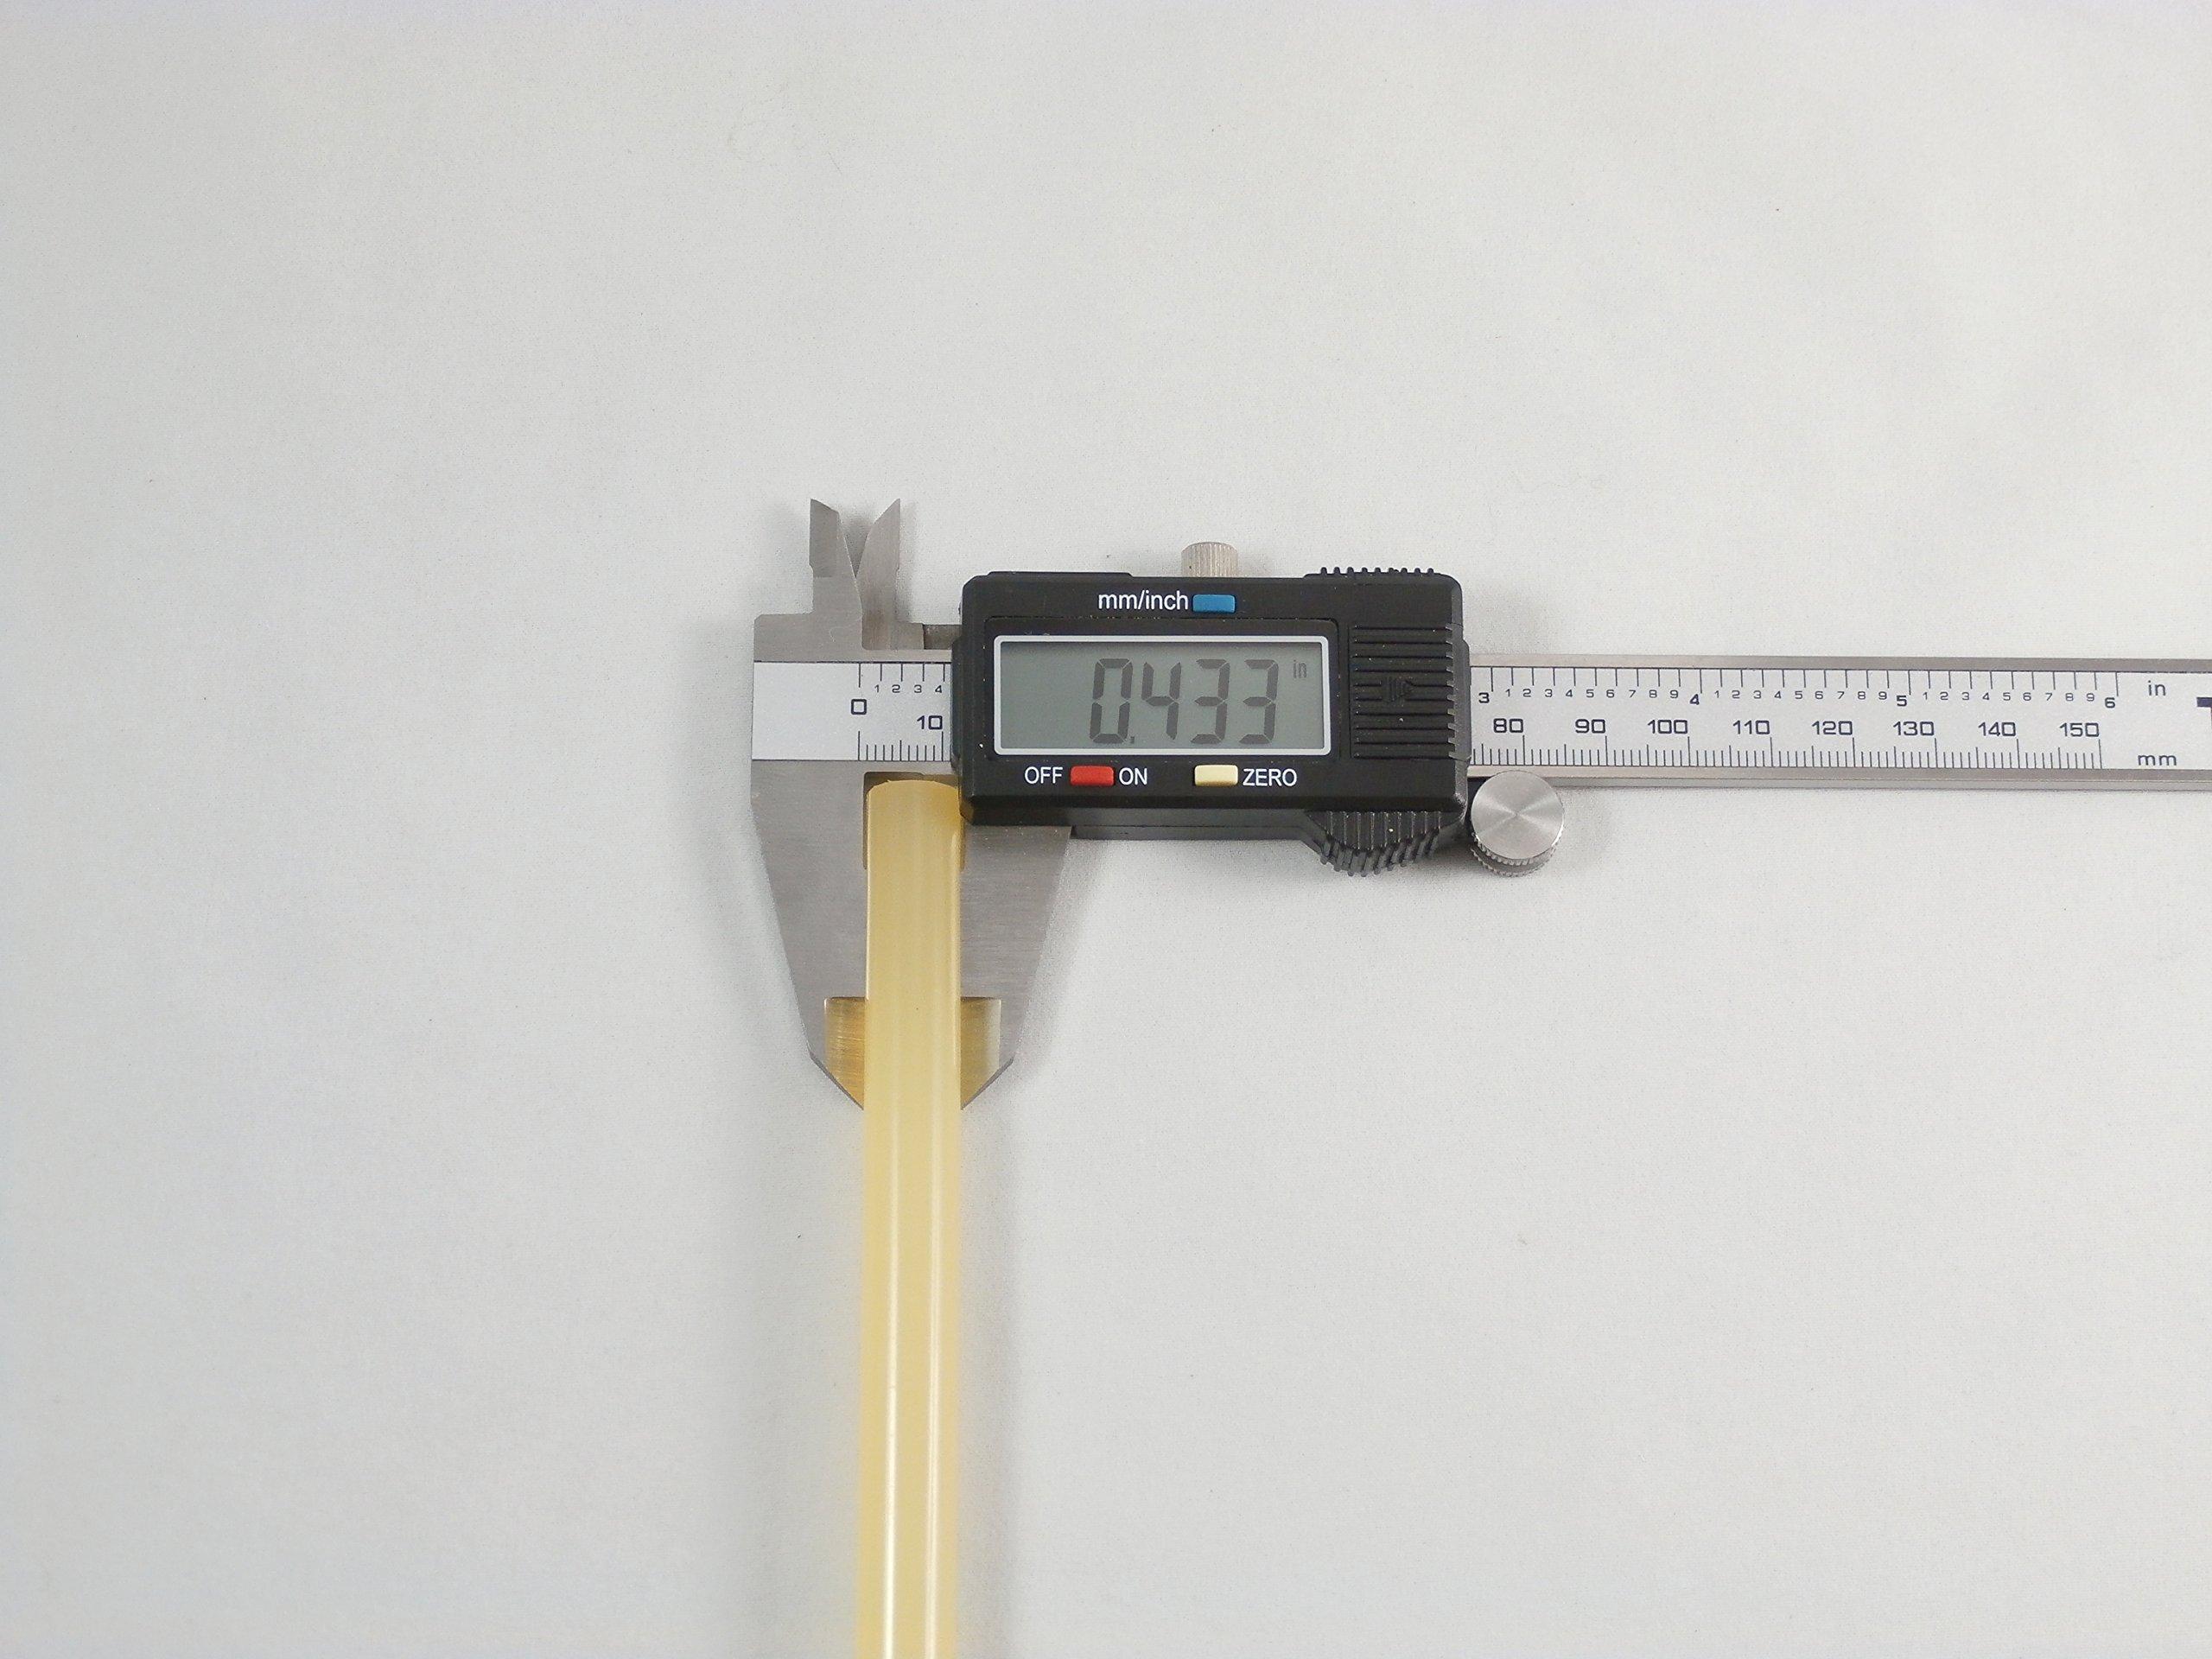 GlueSticksDirect PDR Glue Sticks Amber 7/16'' X 10'' 12.5 lbs Bulk PDR by GlueSticksDirect.com (Image #2)